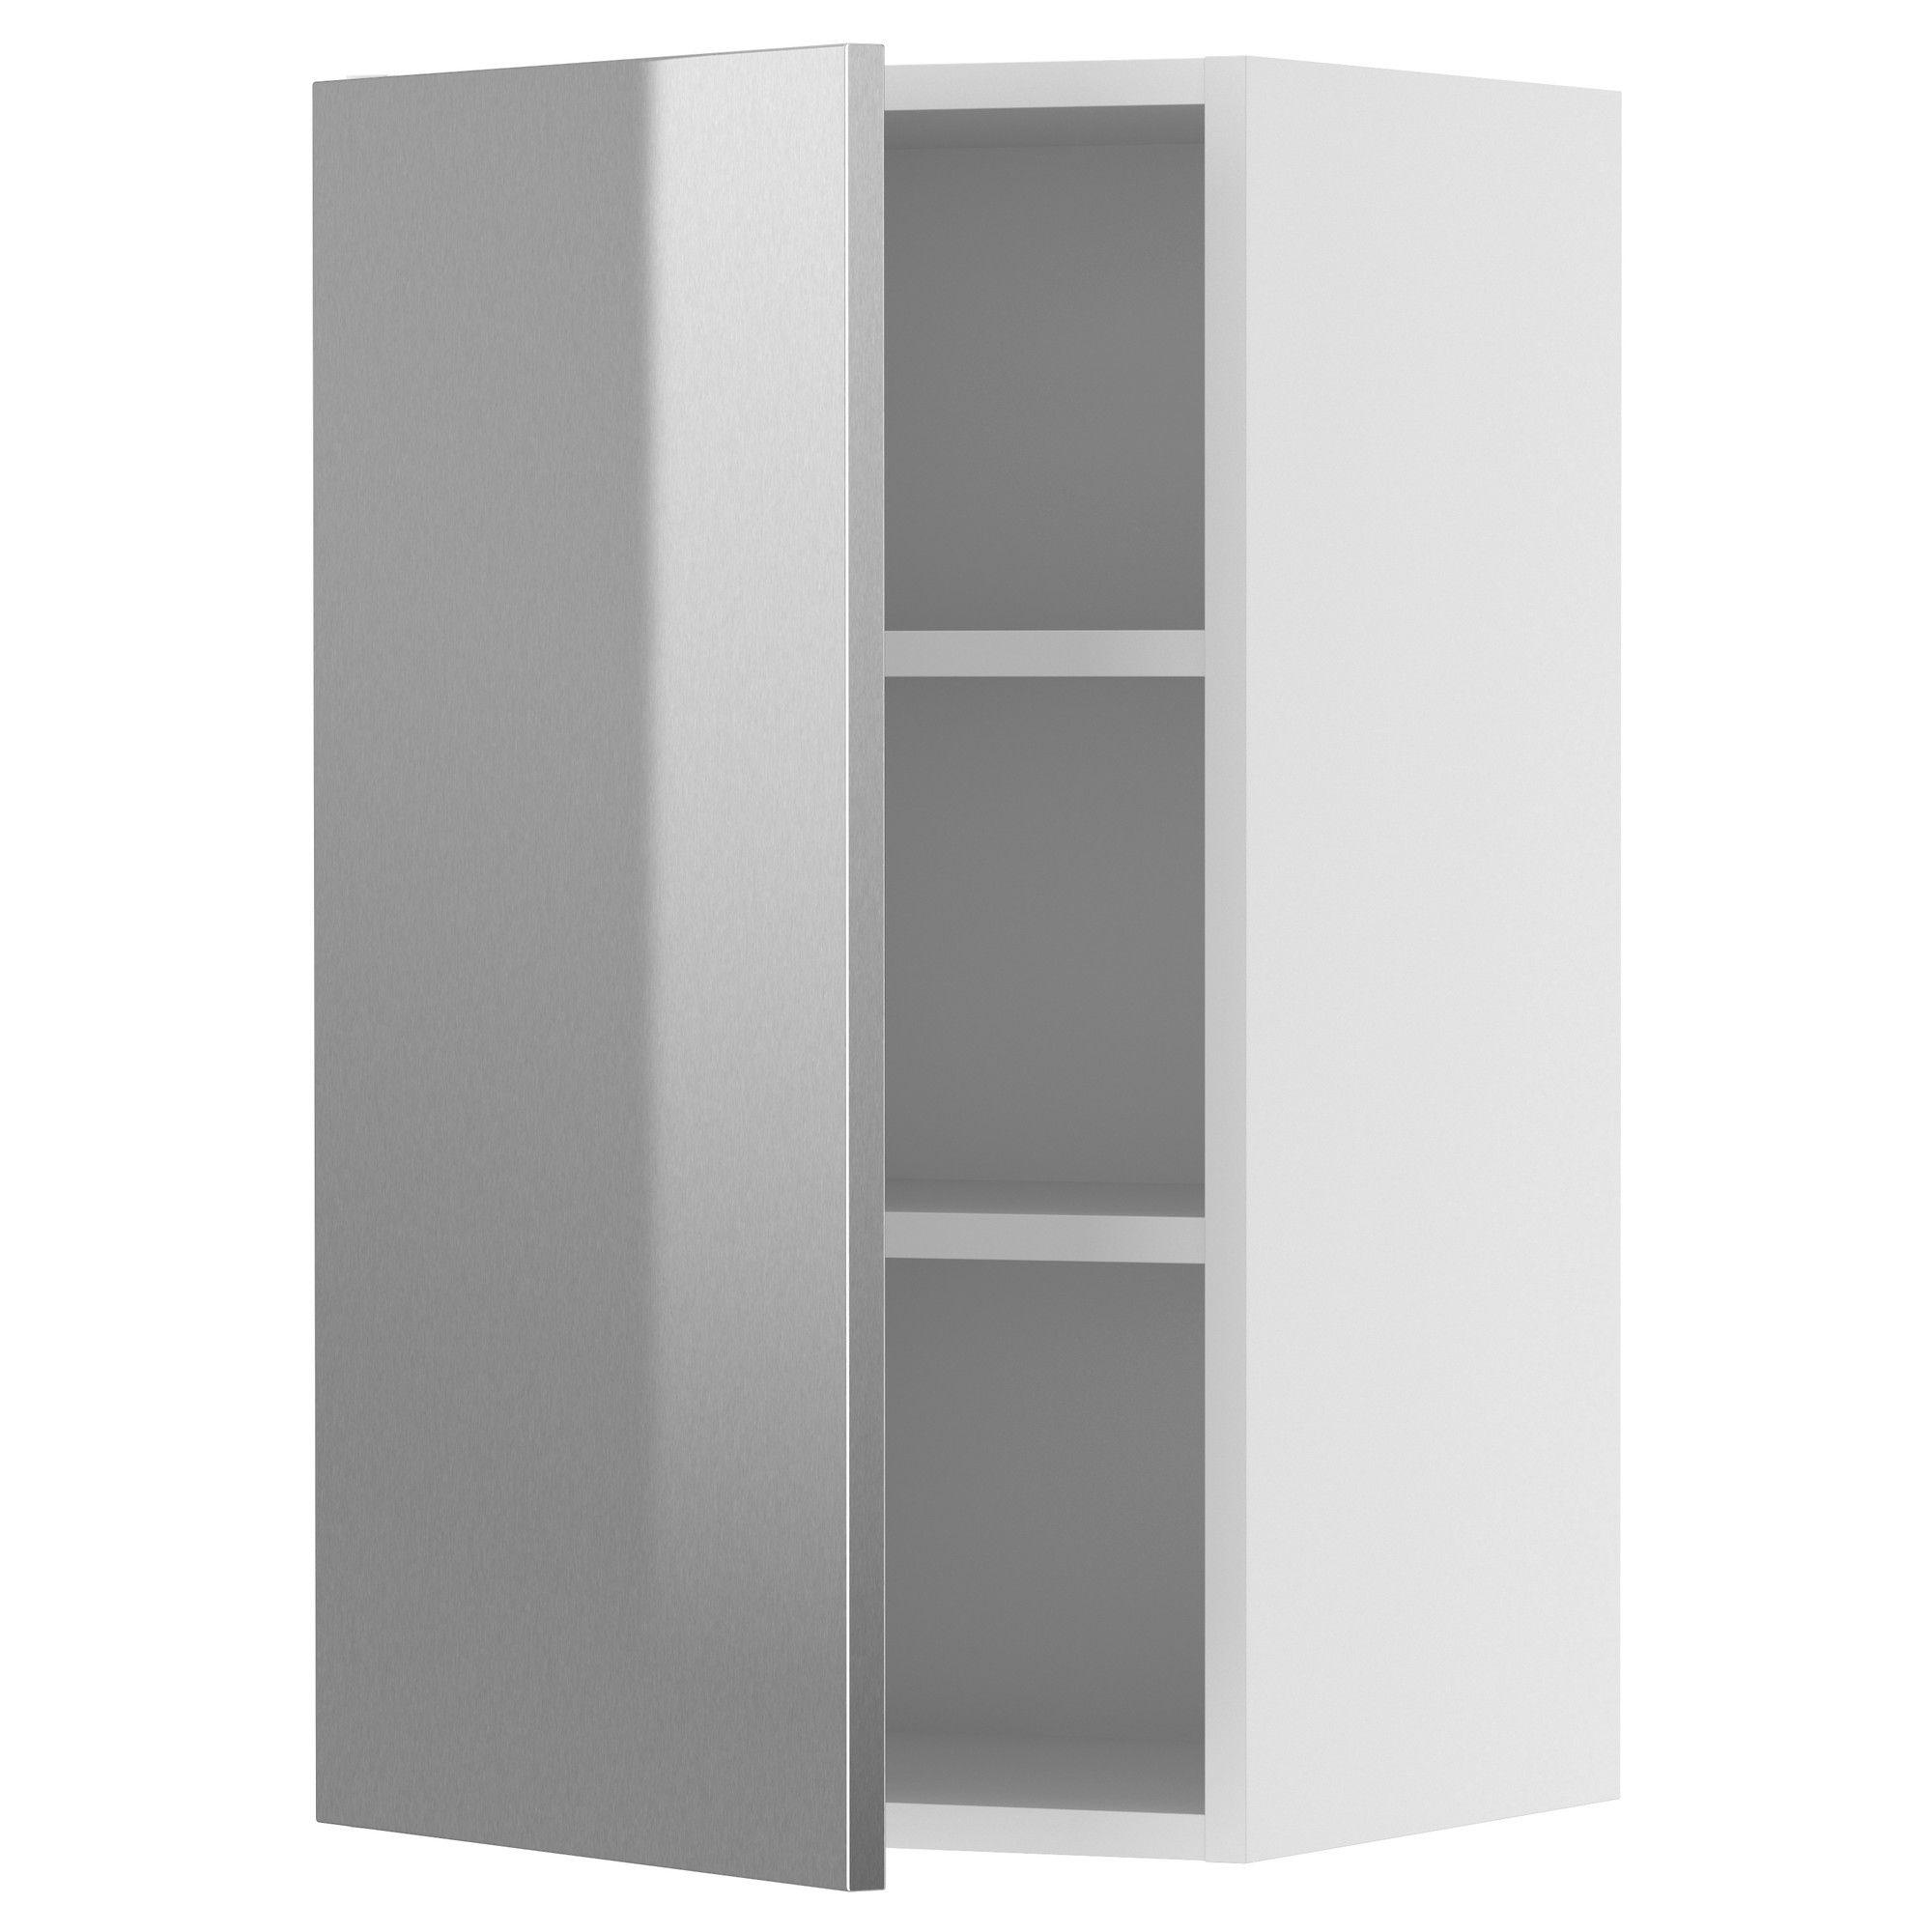 Faktum Wall Cabinet Rubrik Stainless Steel 30×70 Cm Ikea  # Muebles Cocina Ikea Faktum